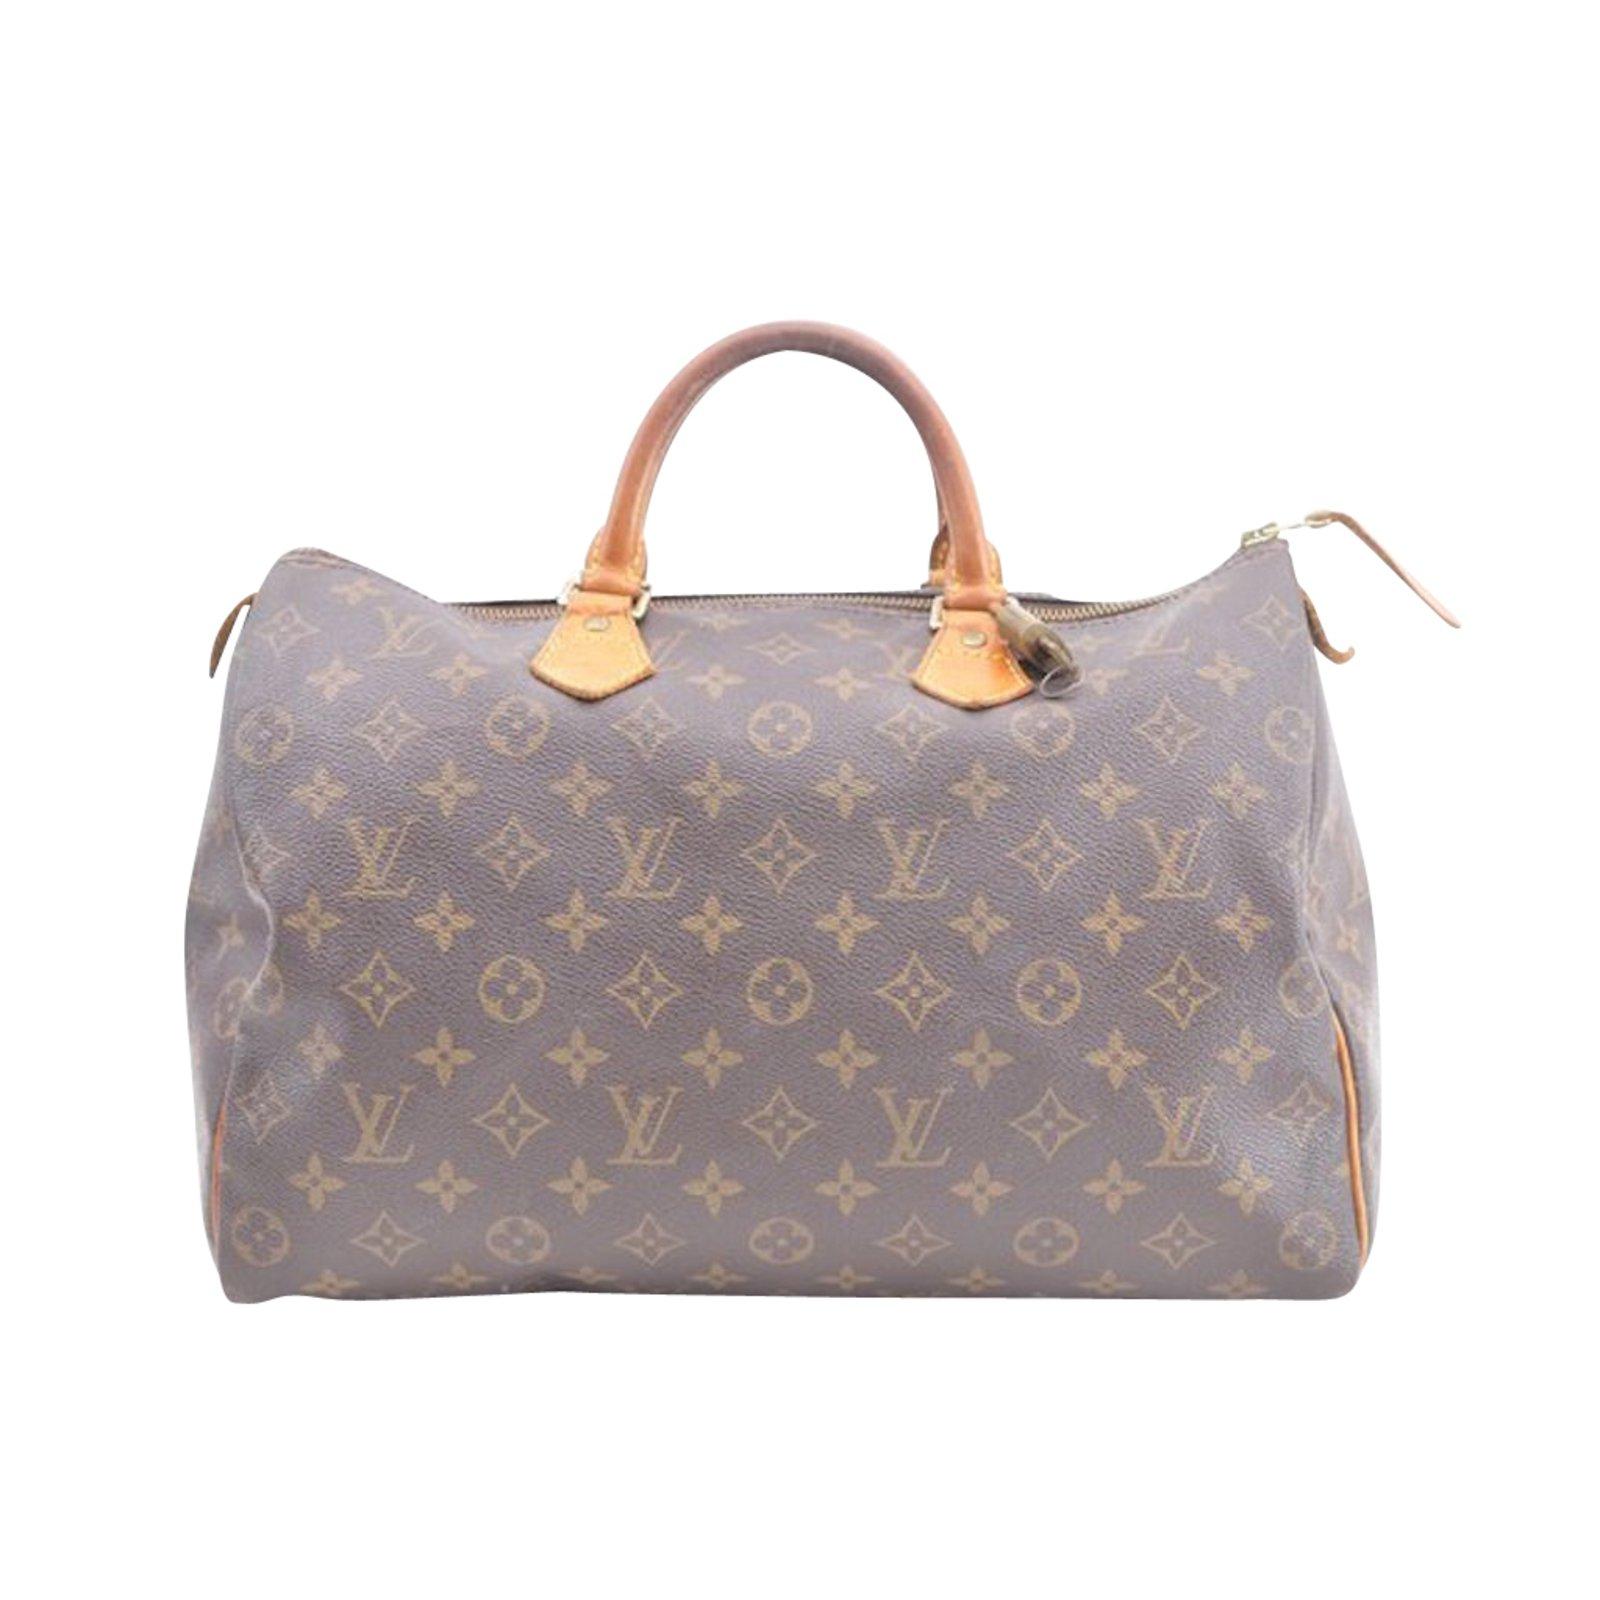 9c578b1dafb7 Sacs à main Louis Vuitton Louis Vuitton Speedy 35 monogramme Toile Marron  ref.86778